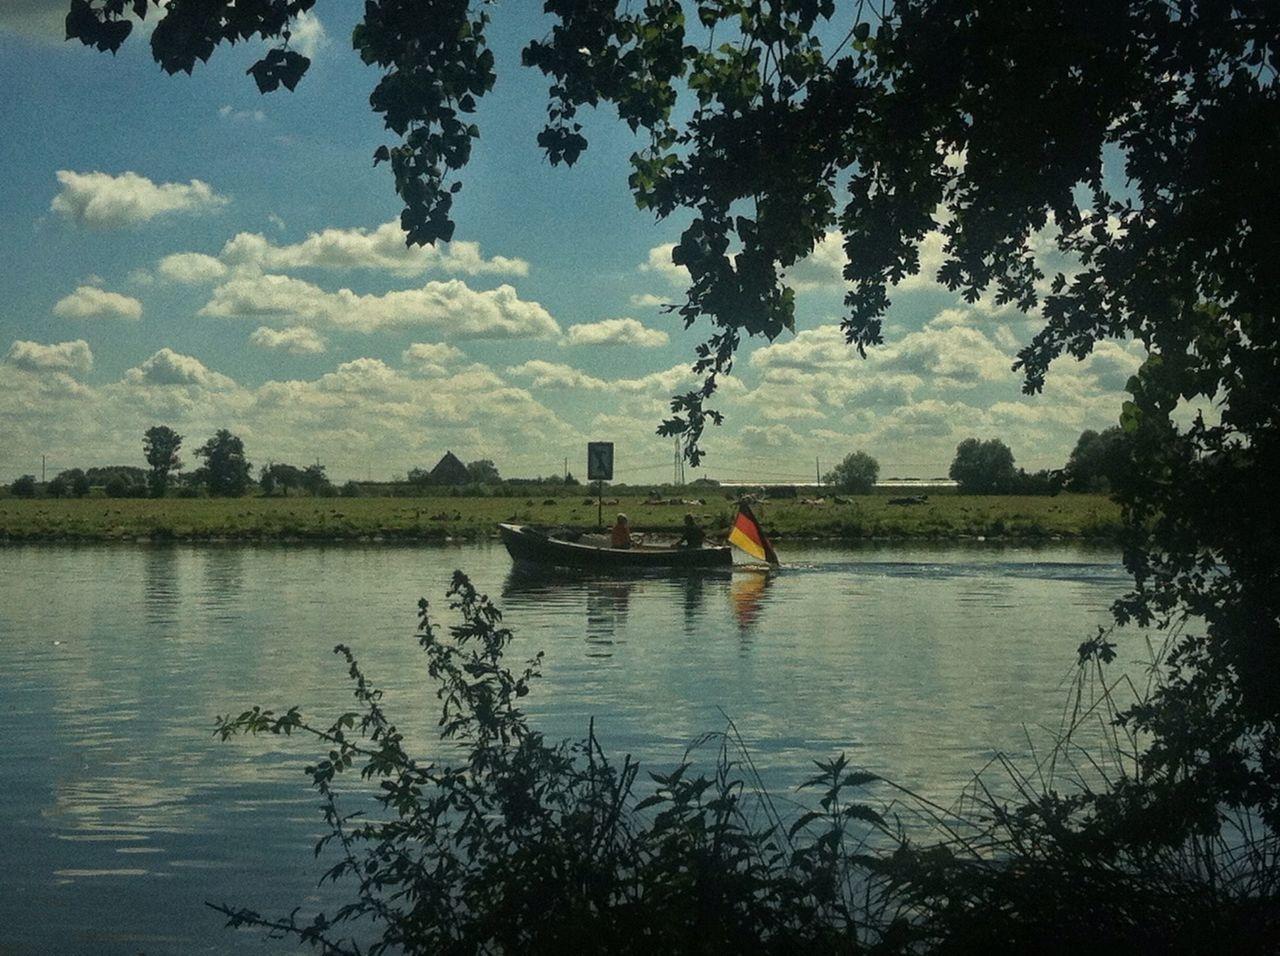 Dove Elbe Hamburg Germany Elbe Elbe River GERMANY🇩🇪DEUTSCHERLAND@ Boat Chilling Hanging Out Vignette Jopesfotos - Nature